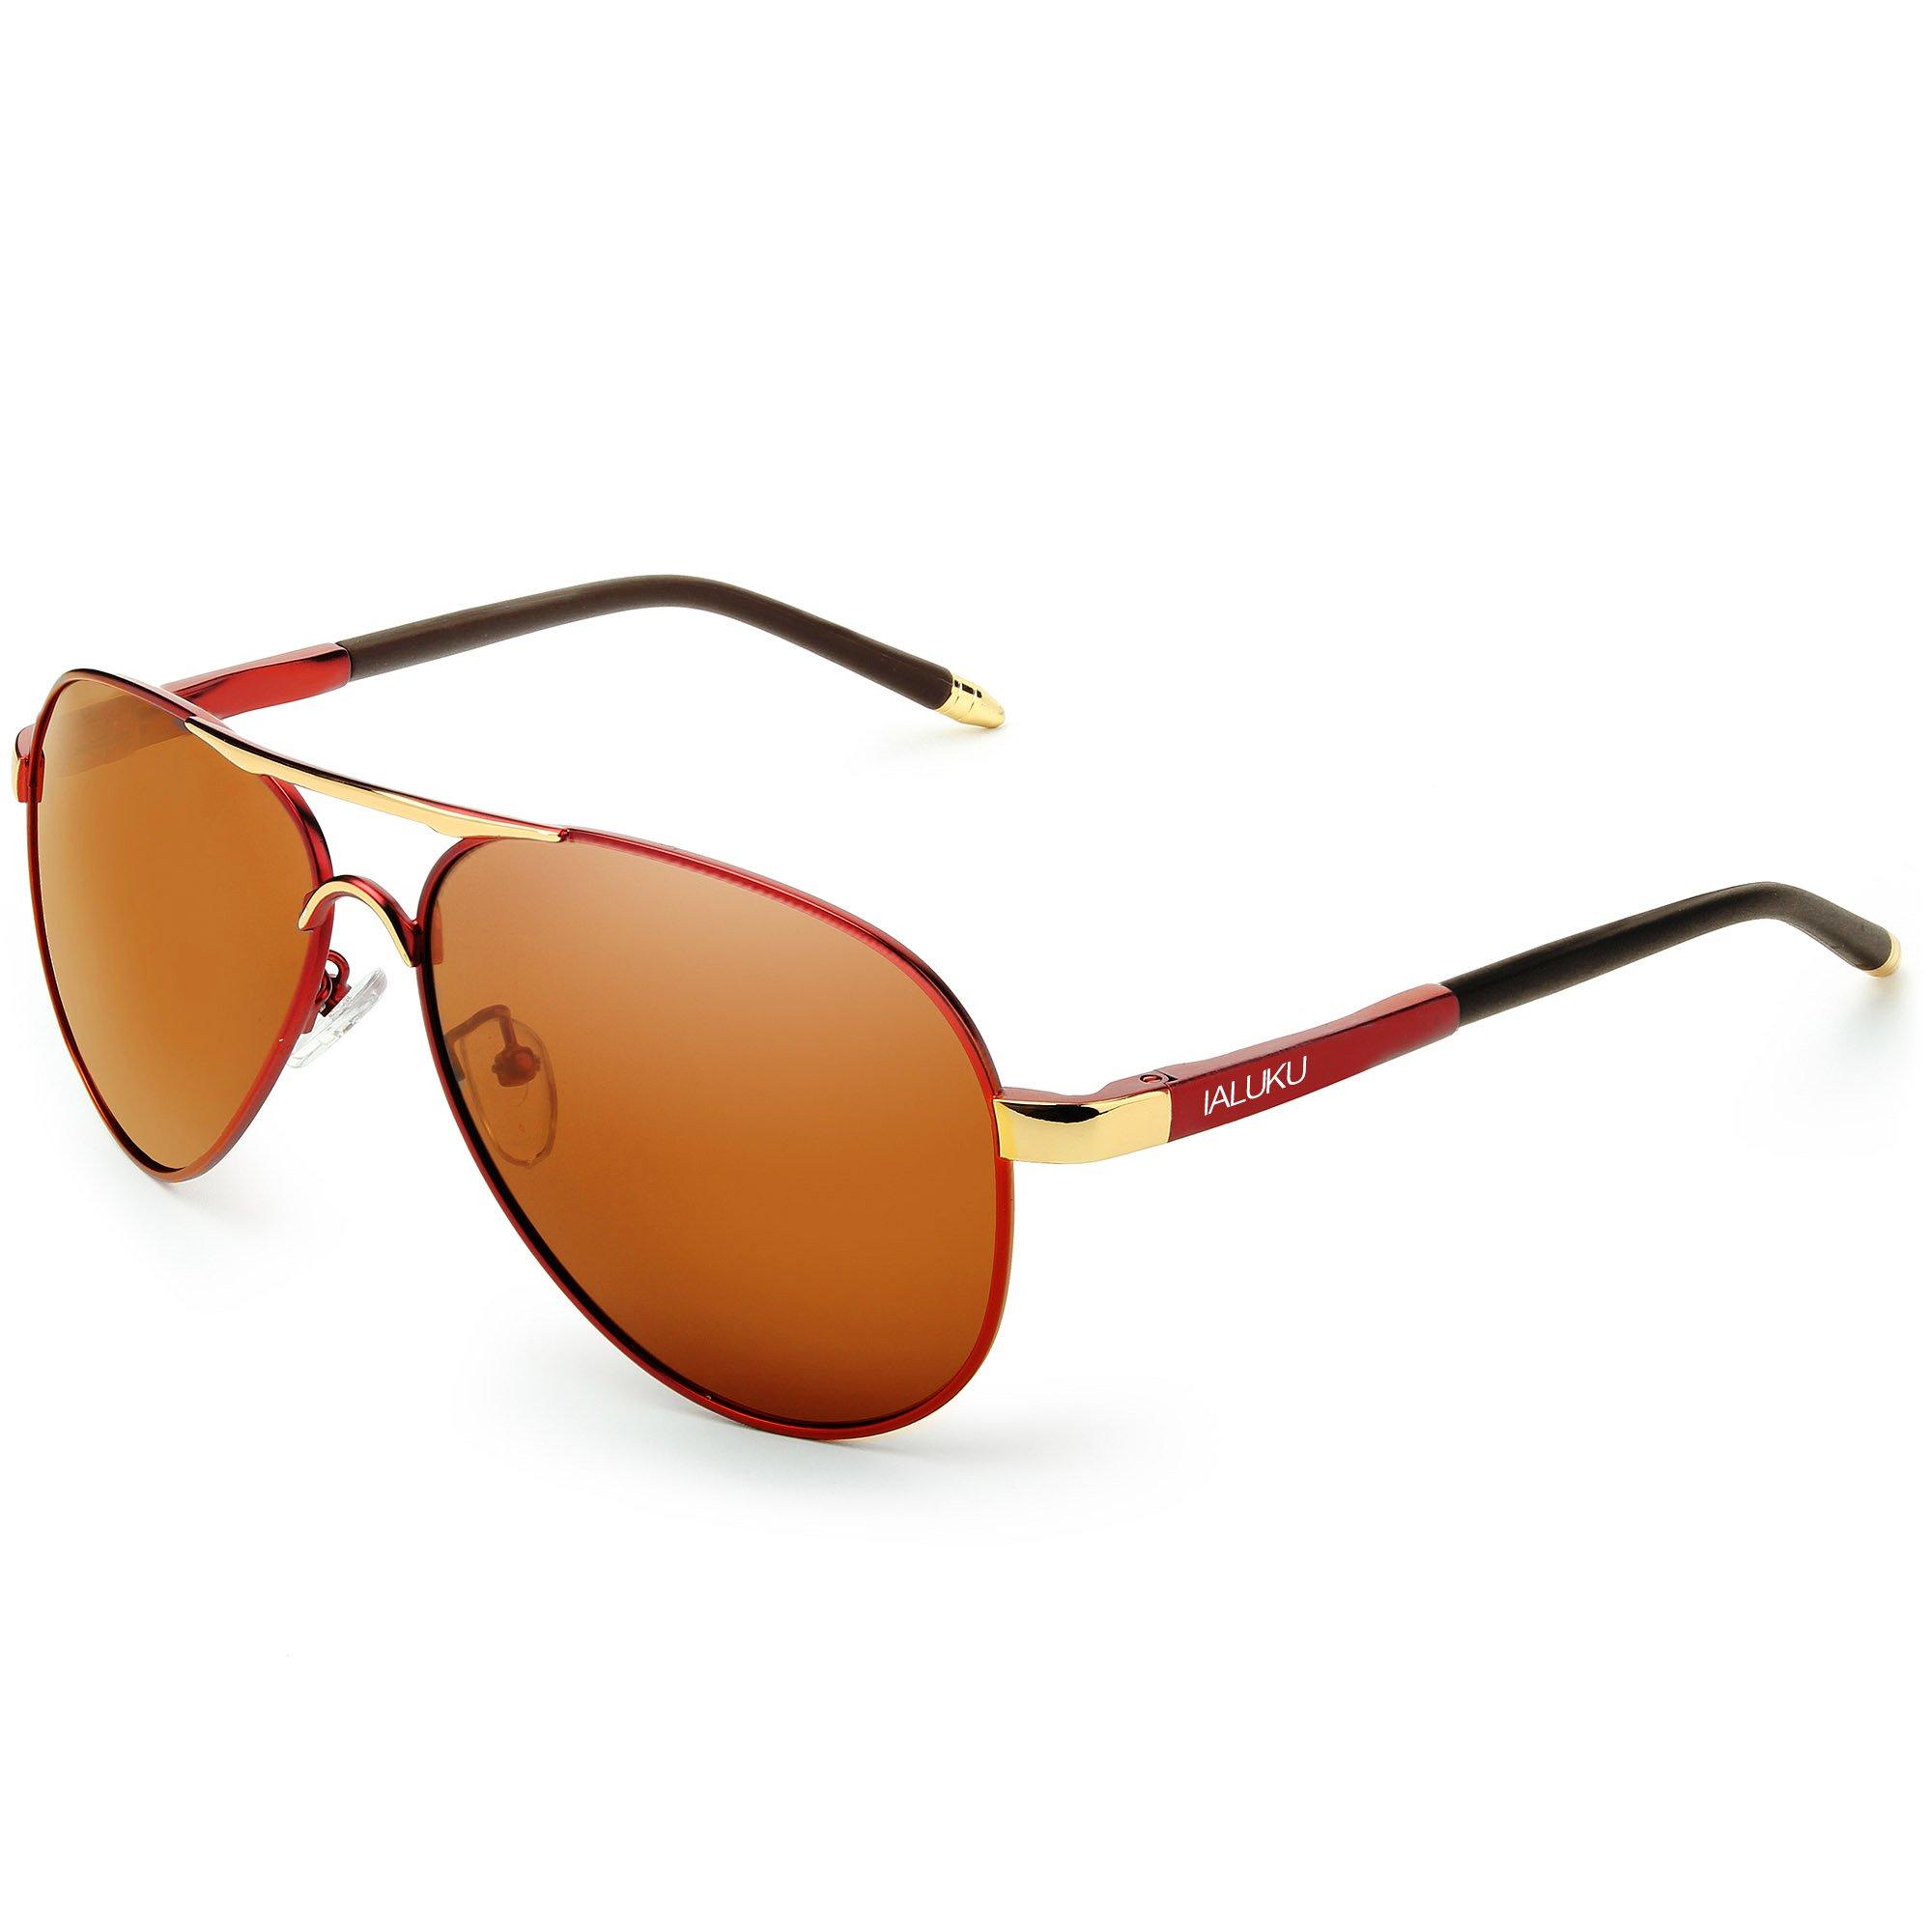 IALUKU Aviator Polarized Sunglasses Metal Frame Pilot Glasses Men Women (Brown / Brown, 58)